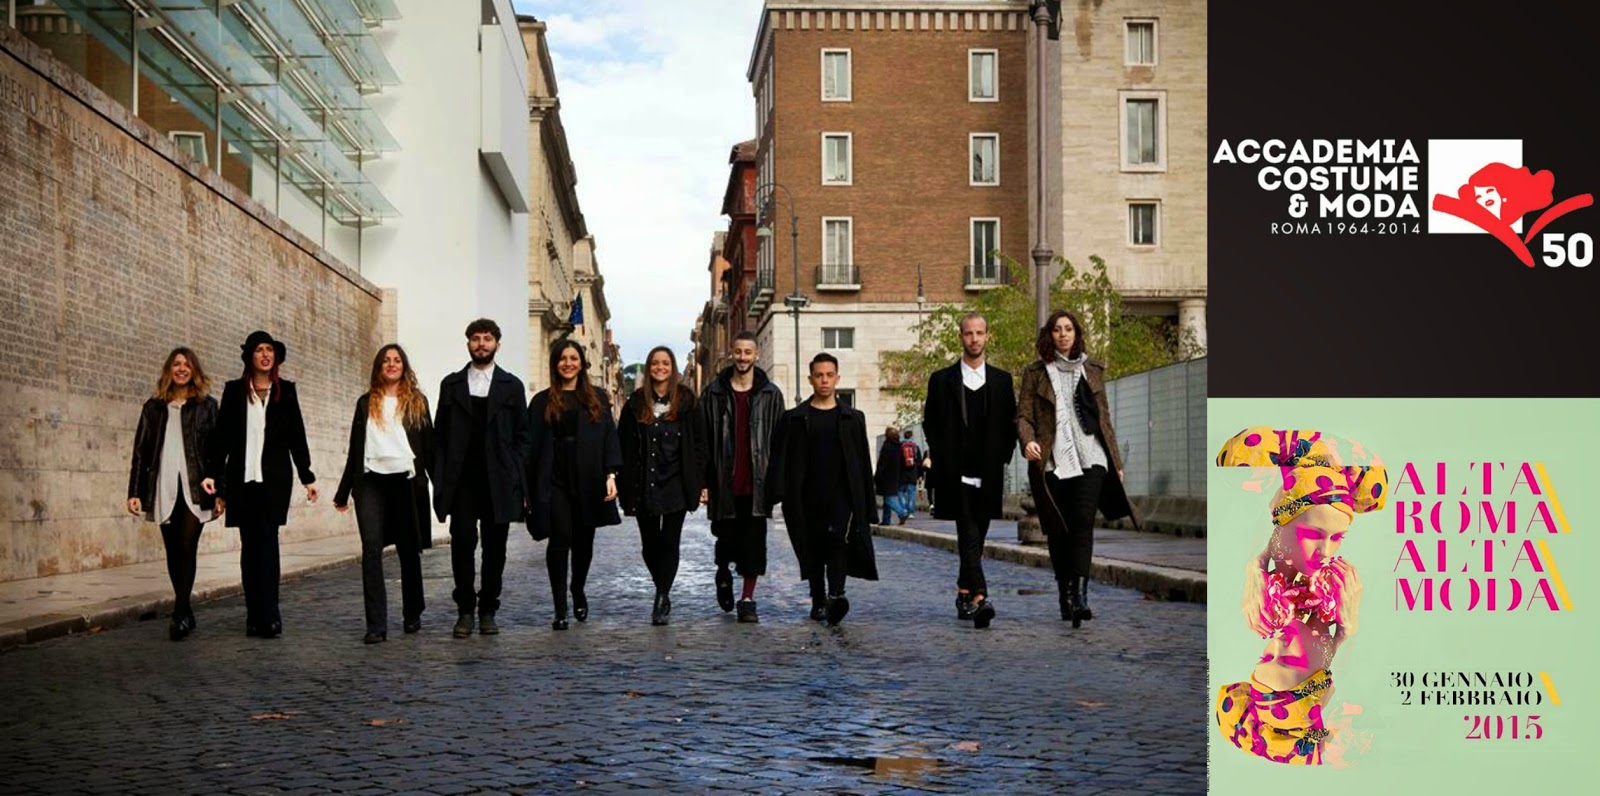 Final Graduate students of Accademia Costume & Moda, Rome ...